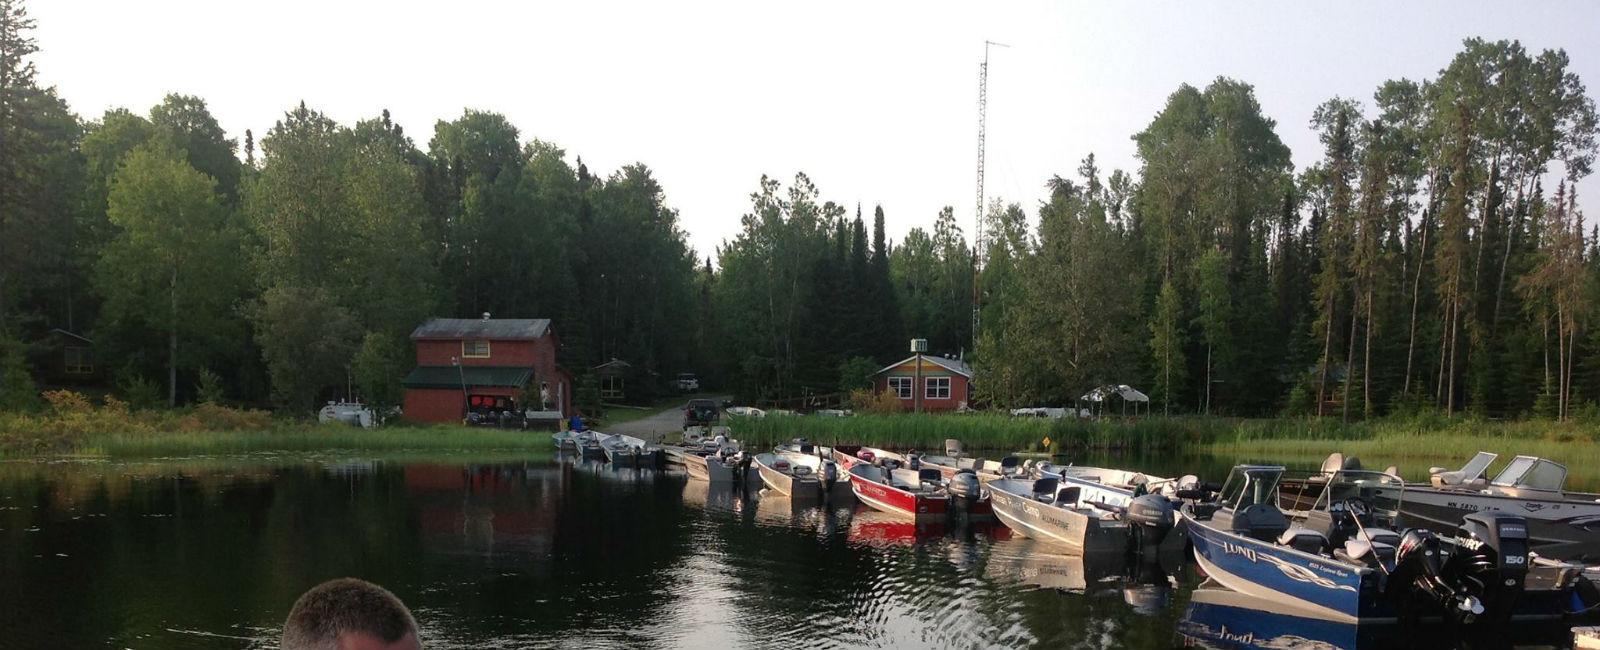 Woman river camp northwest ontario my canada fishing trip for Ontario canada fishing trips